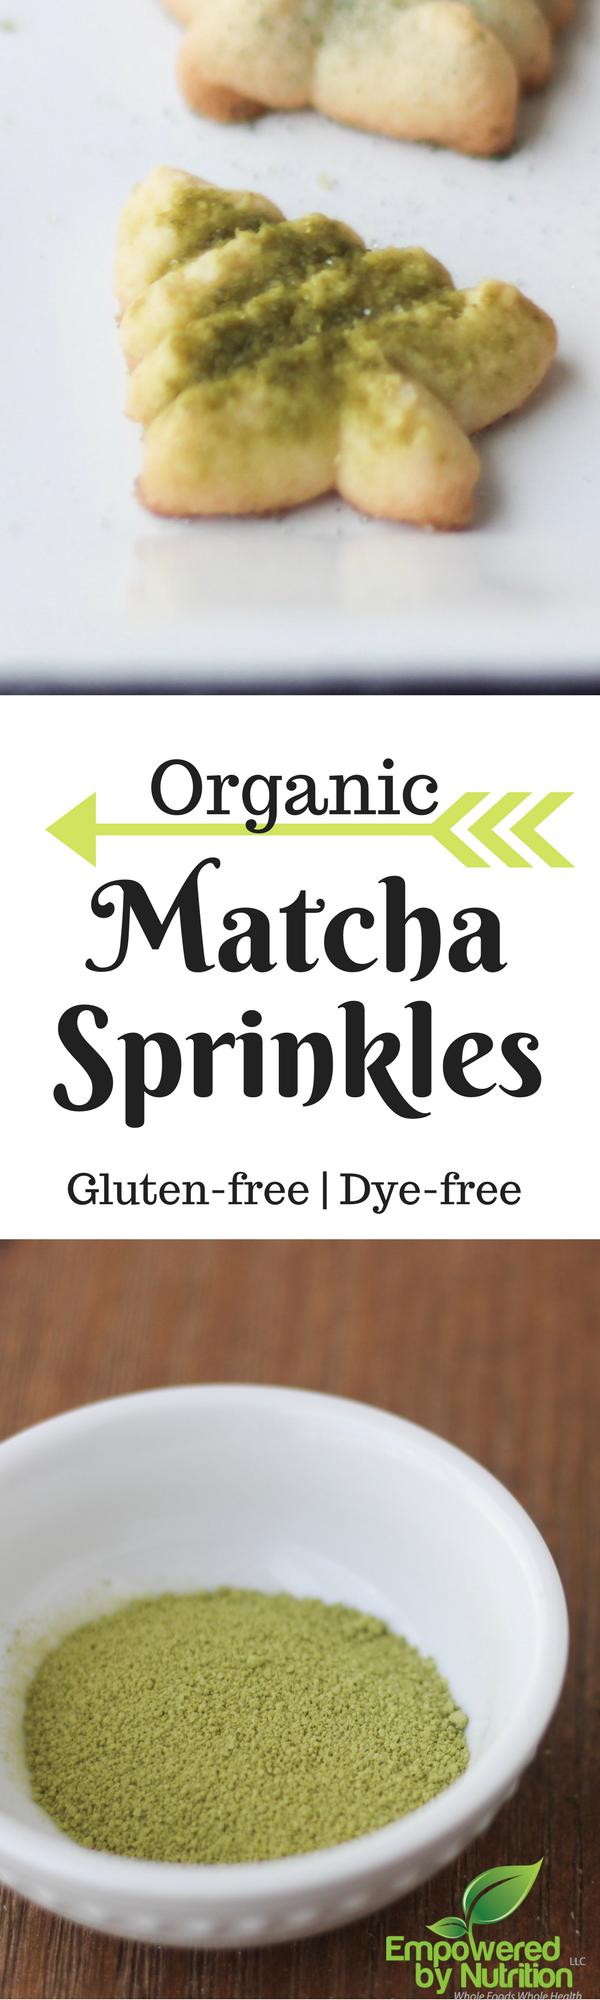 Gluten-free dye-free matcha sprinkles